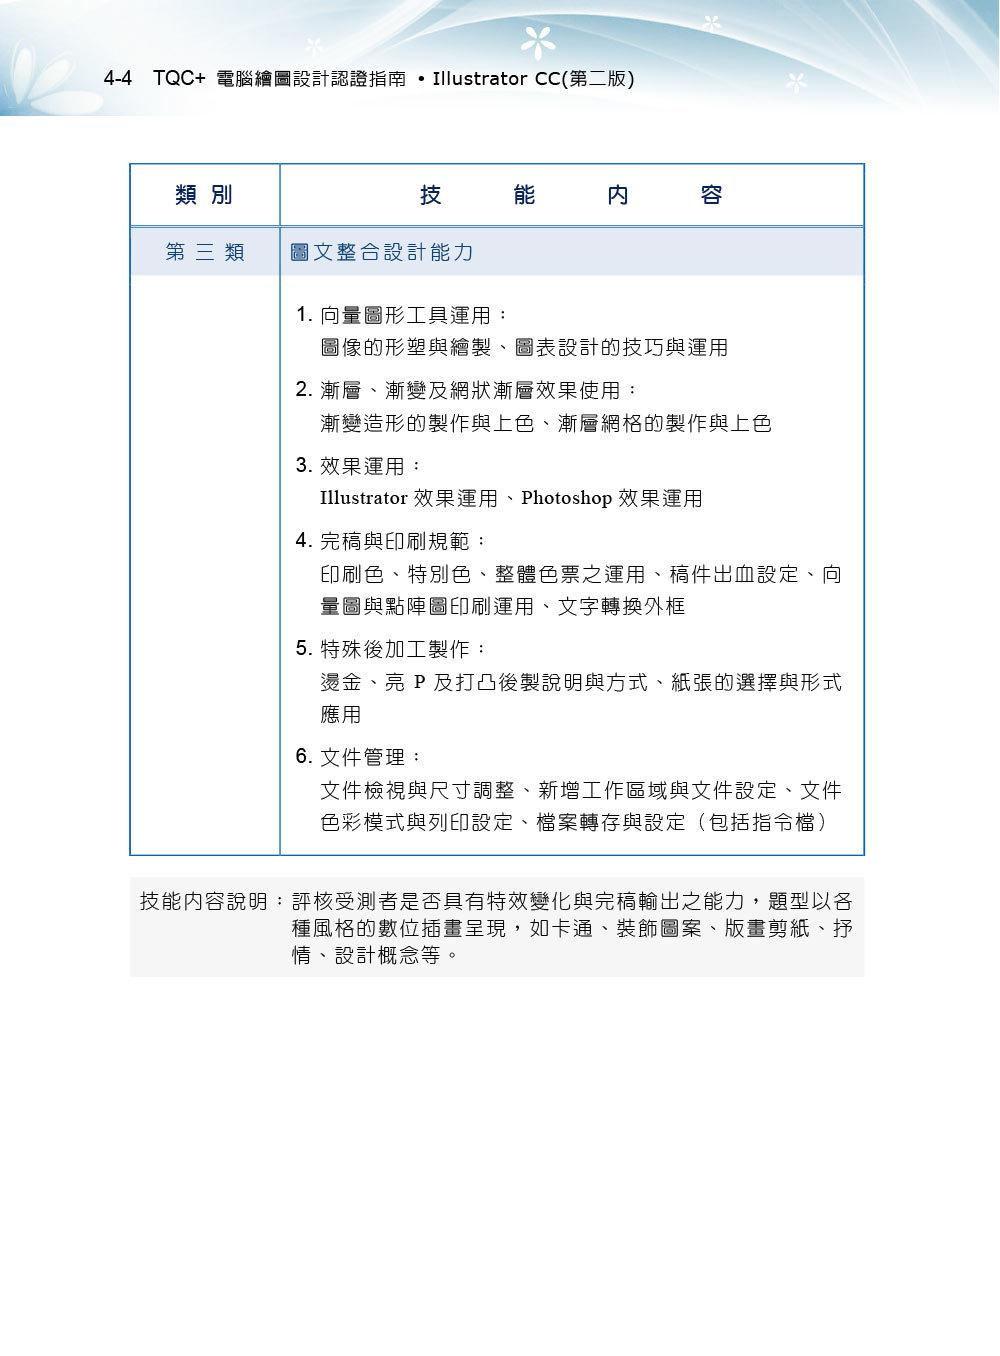 TQC+ 電腦繪圖設計認證指南 Illustrator CC, 2/e-preview-3